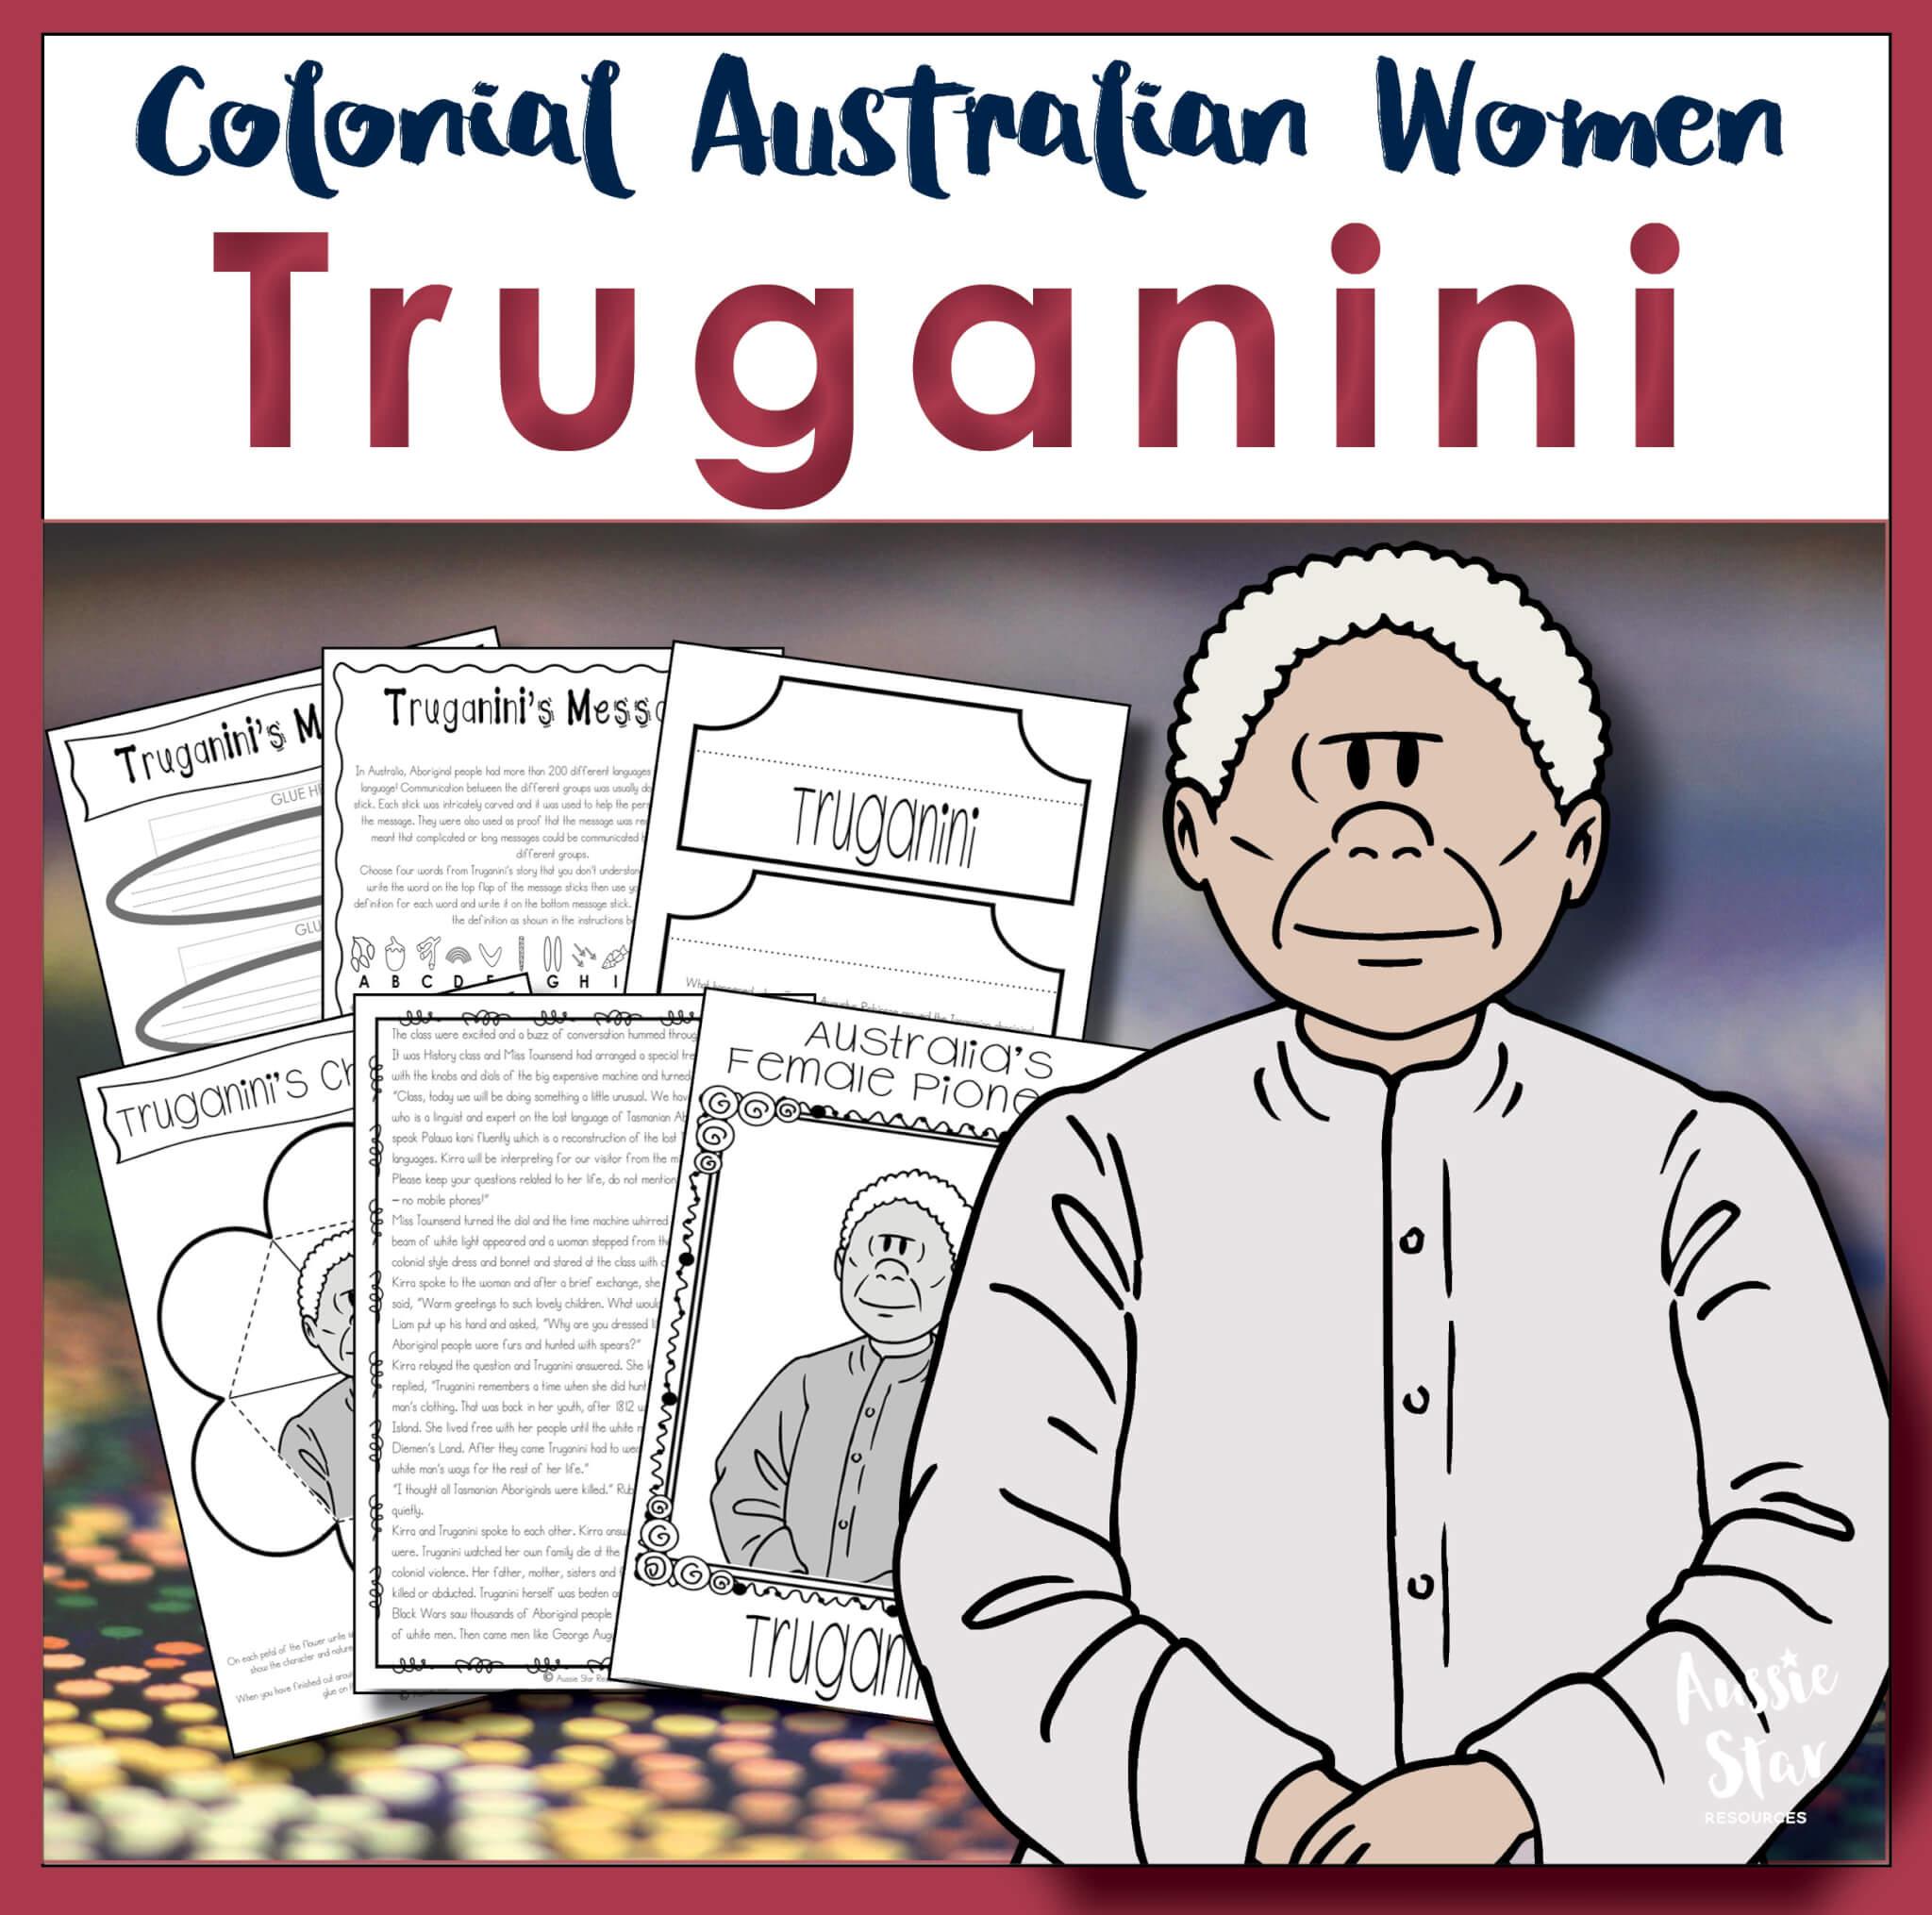 Truganini_Australian_Colonial_Women